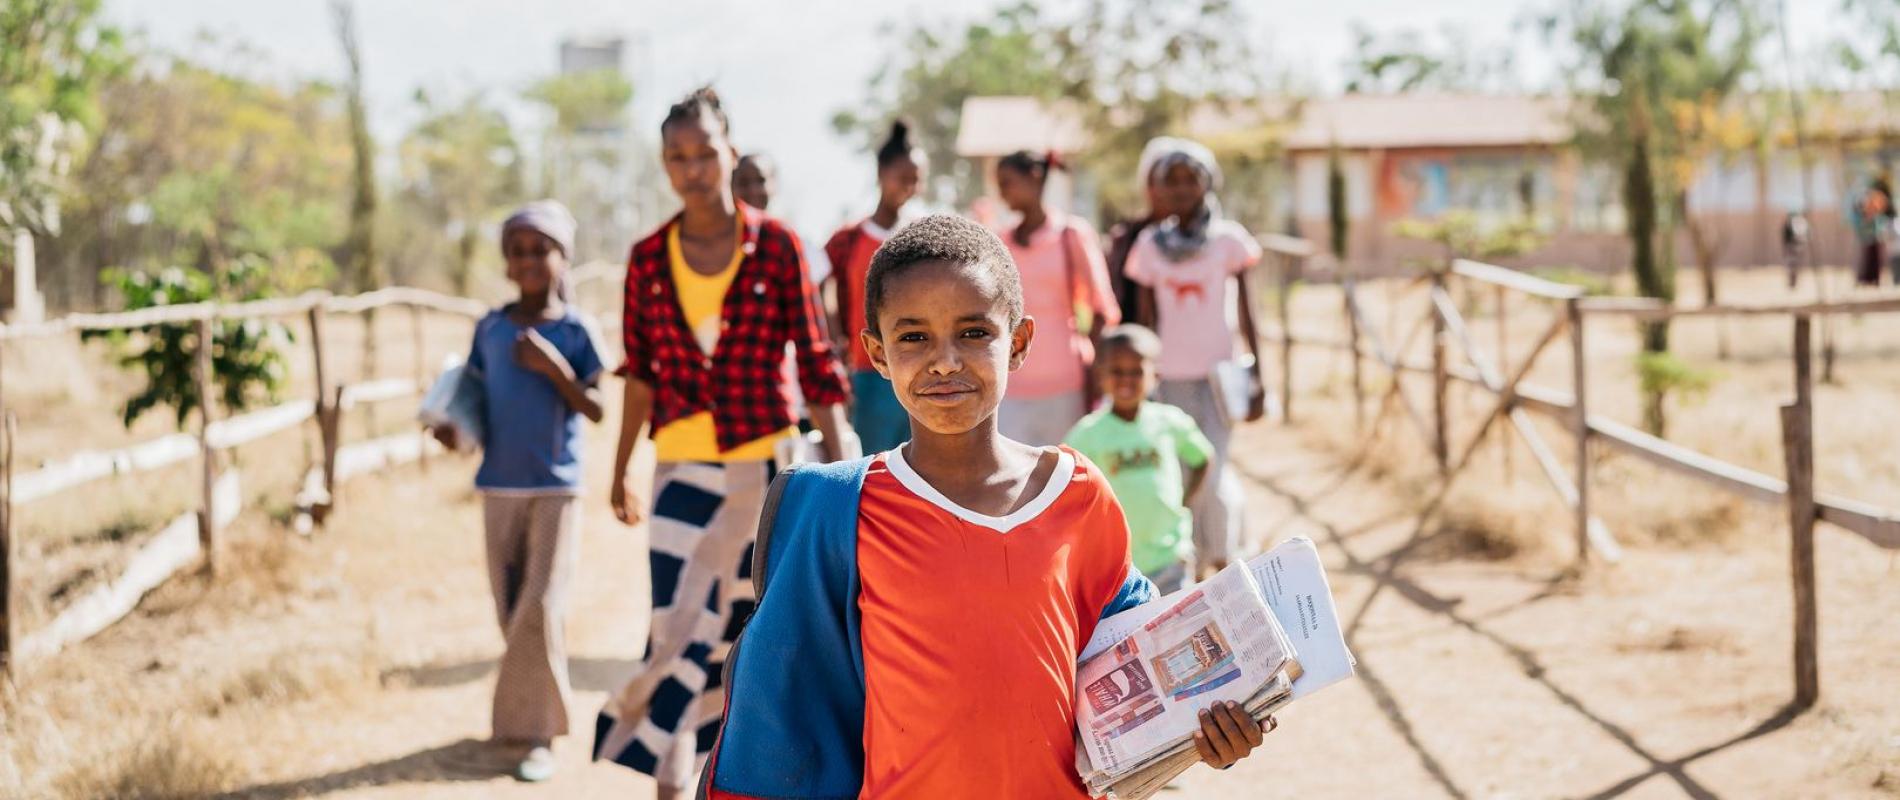 2018 12 04 ethiopie (afdrukkwaliteit) 47